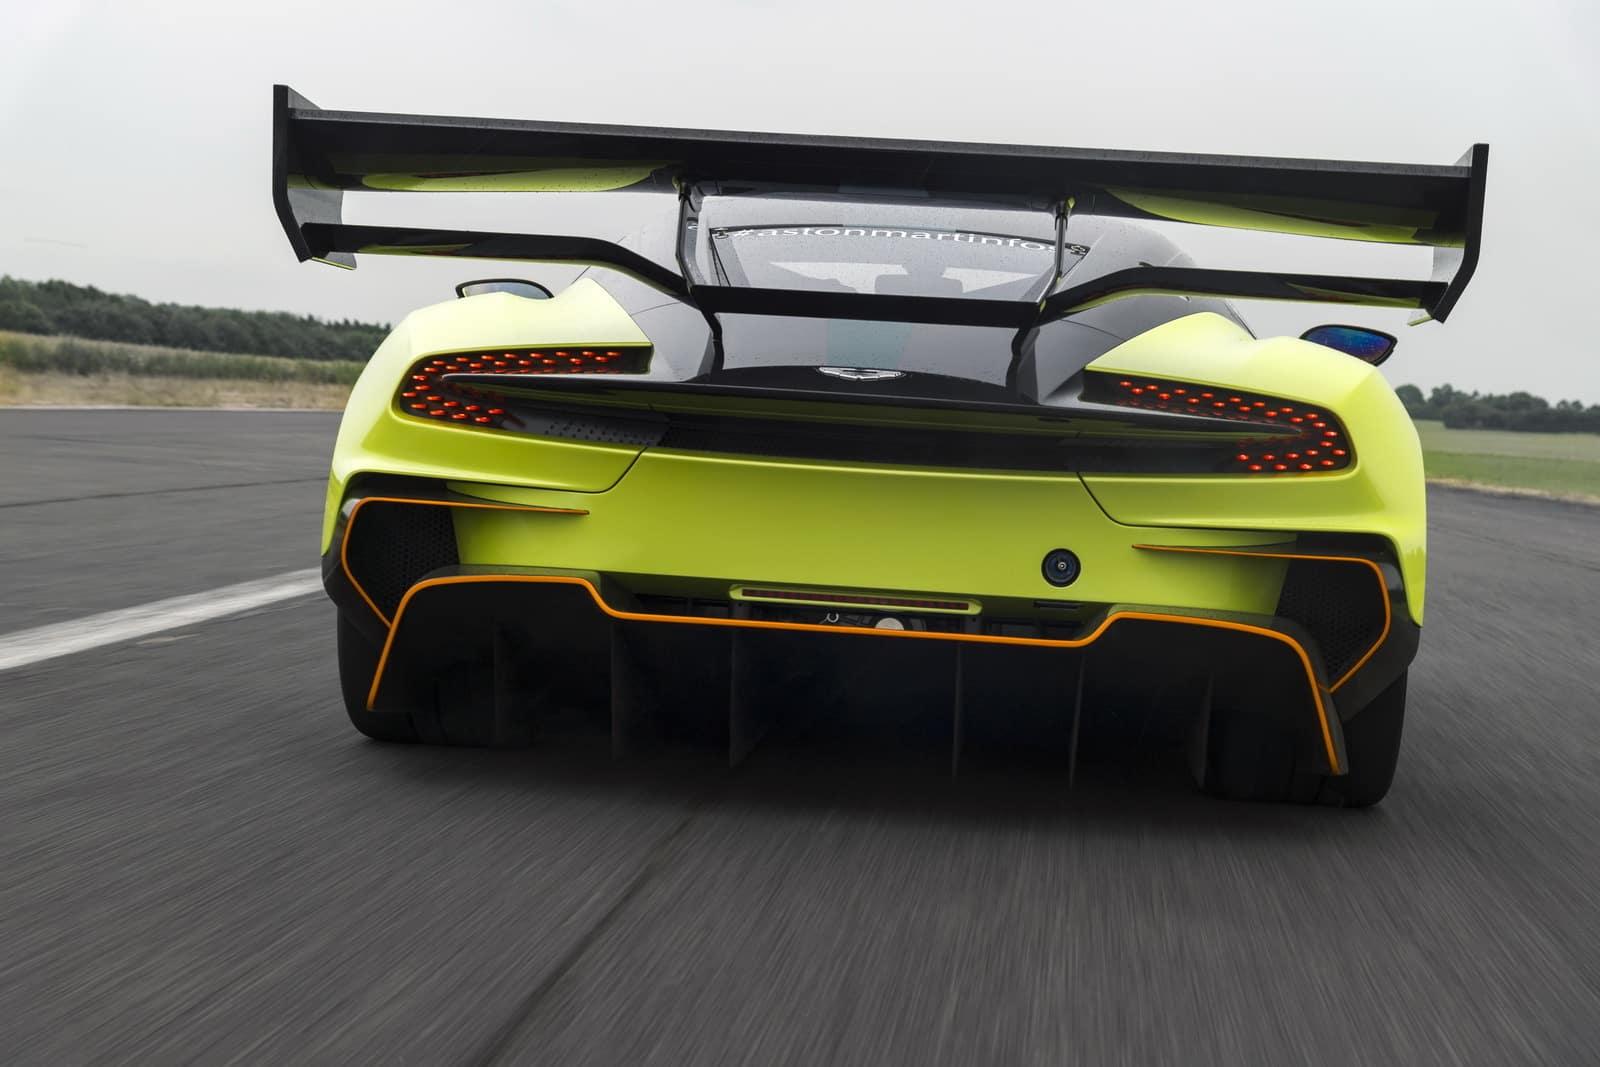 Aston Martin Vulcan AMR PRO 4